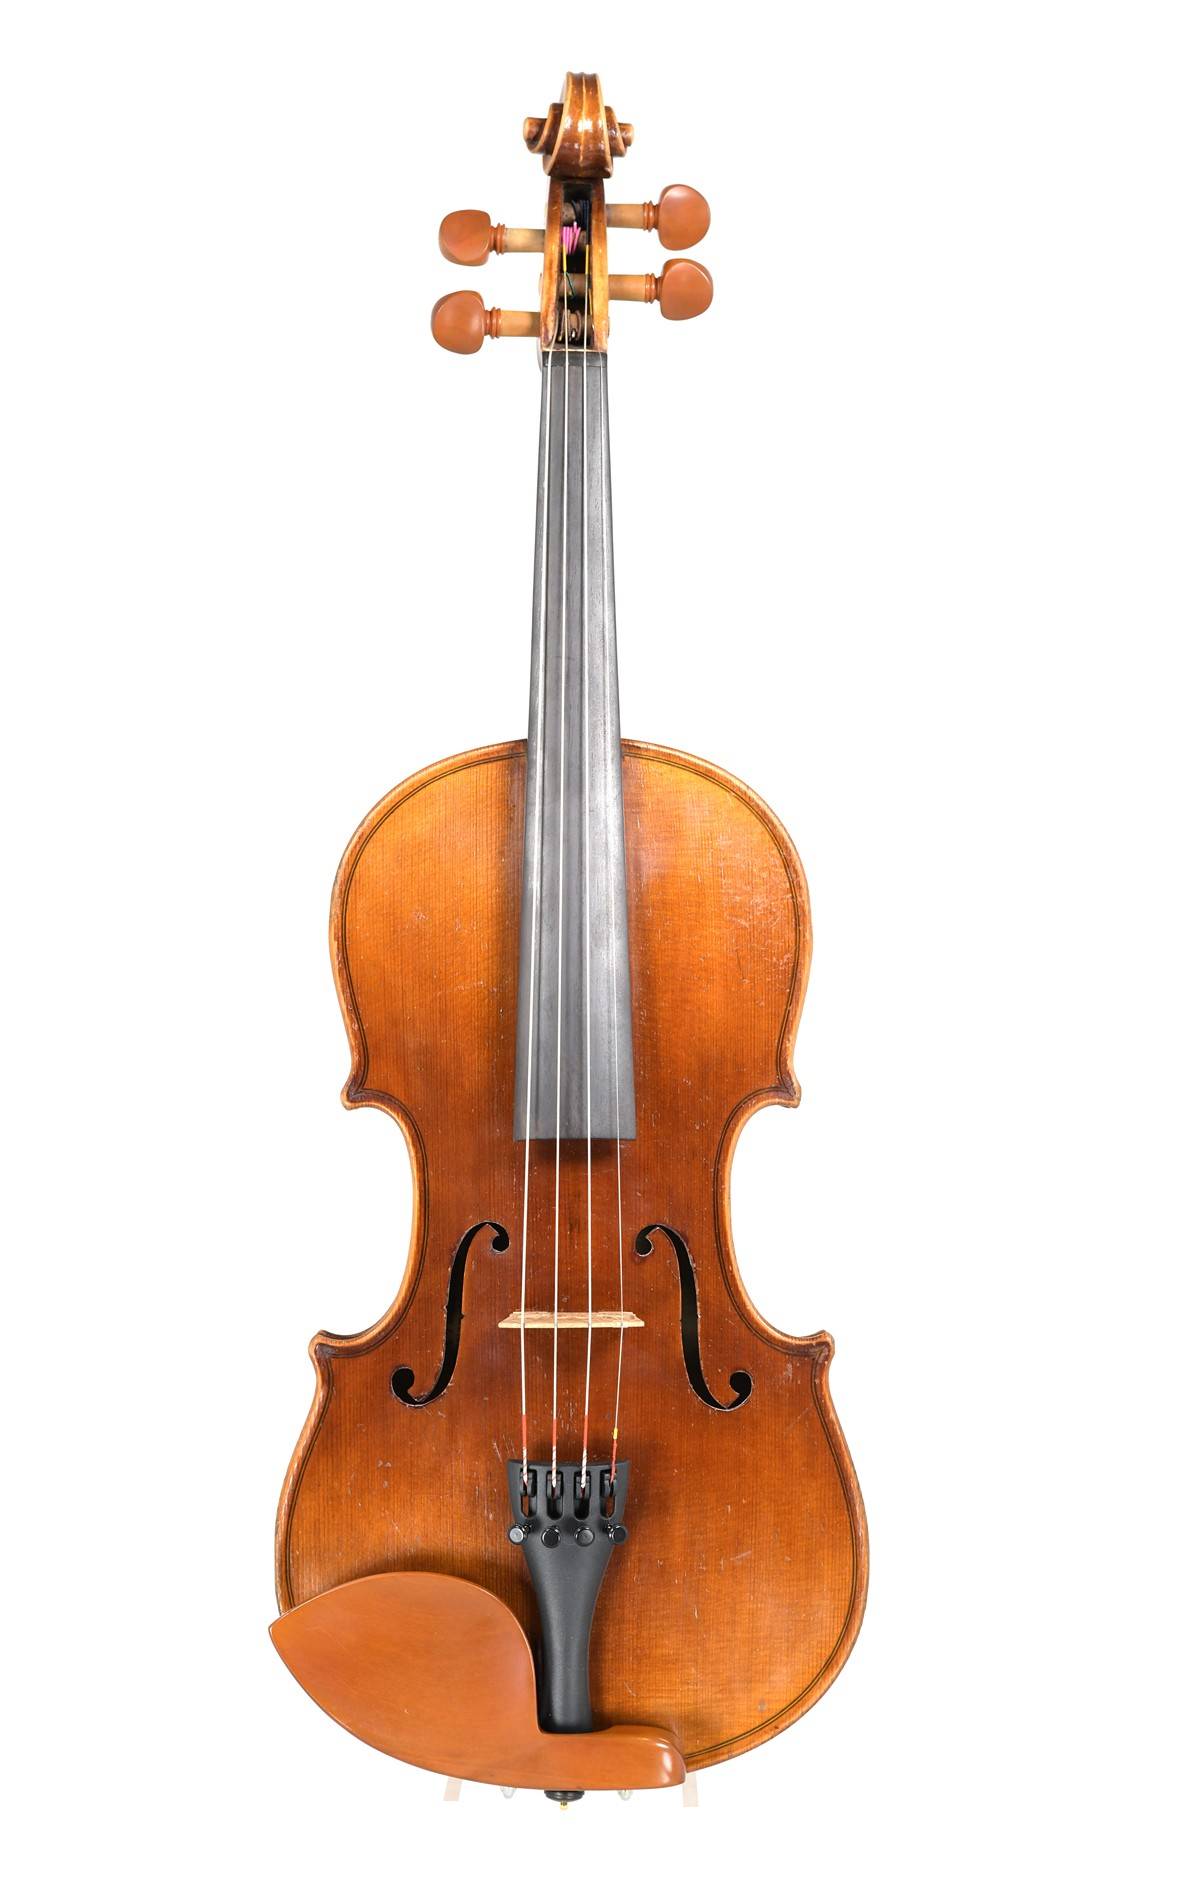 3/4 violin by E. L. Gütter